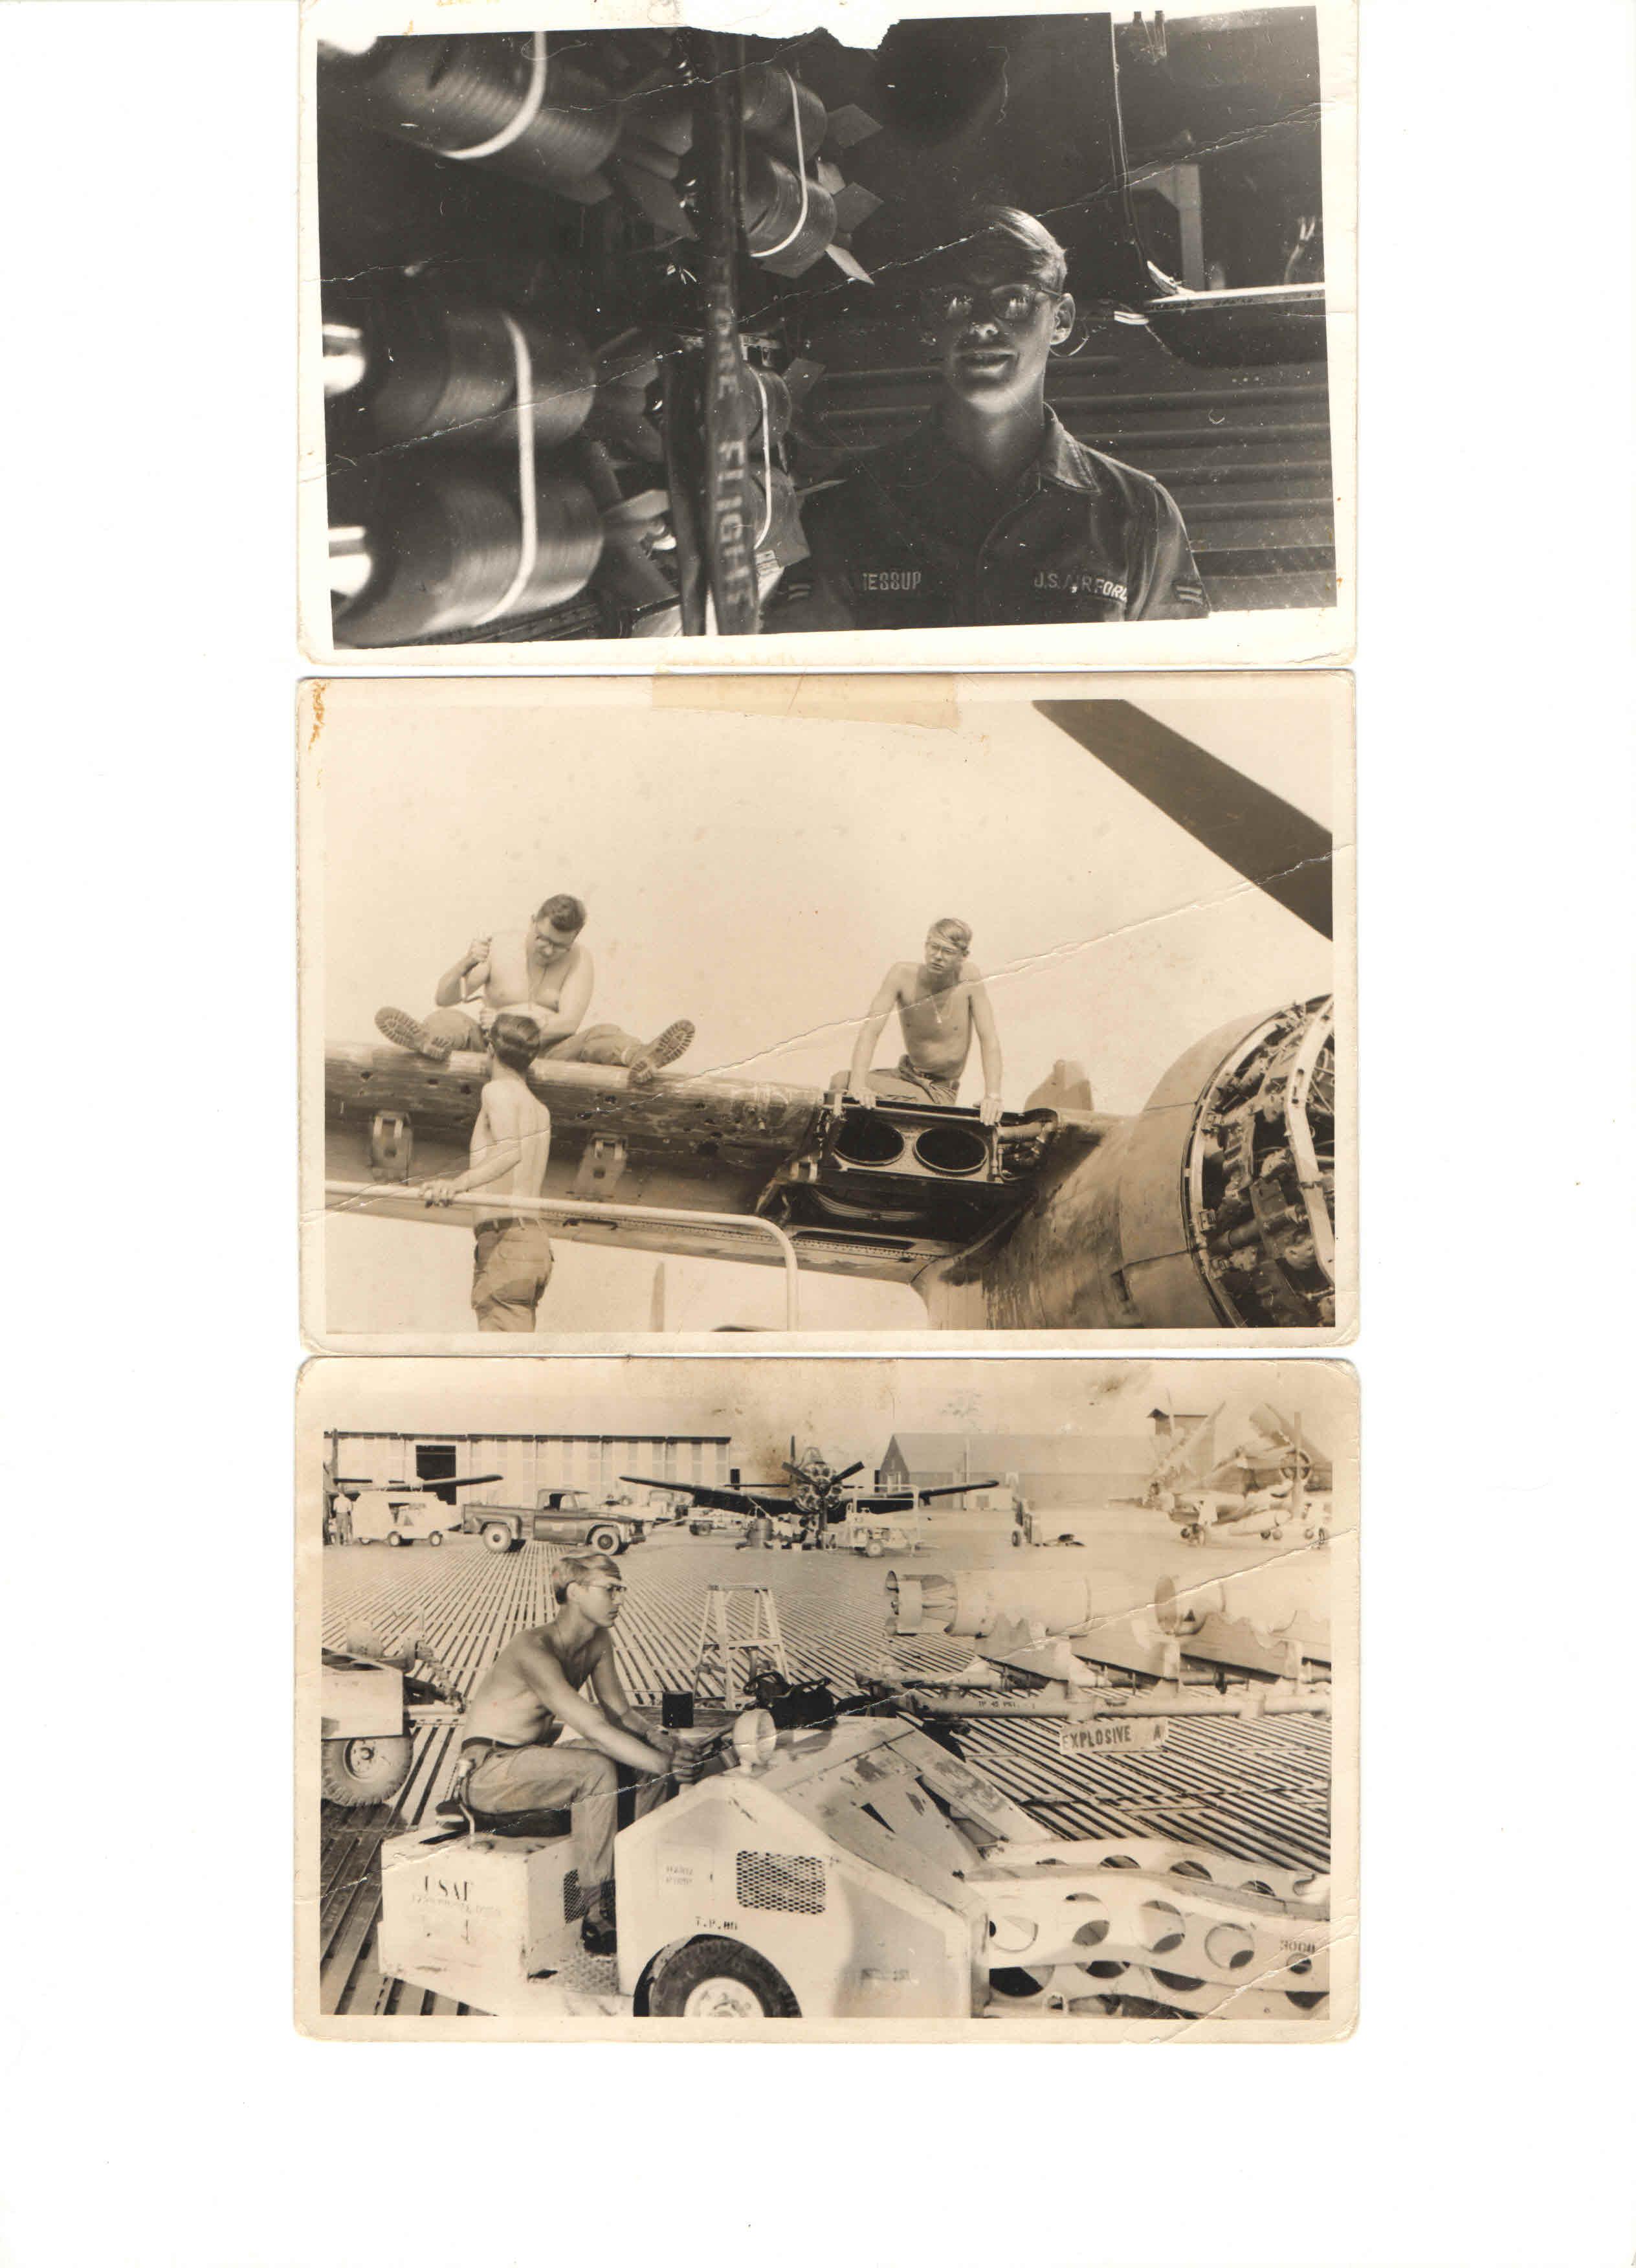 war-pics-1967-8.jpg